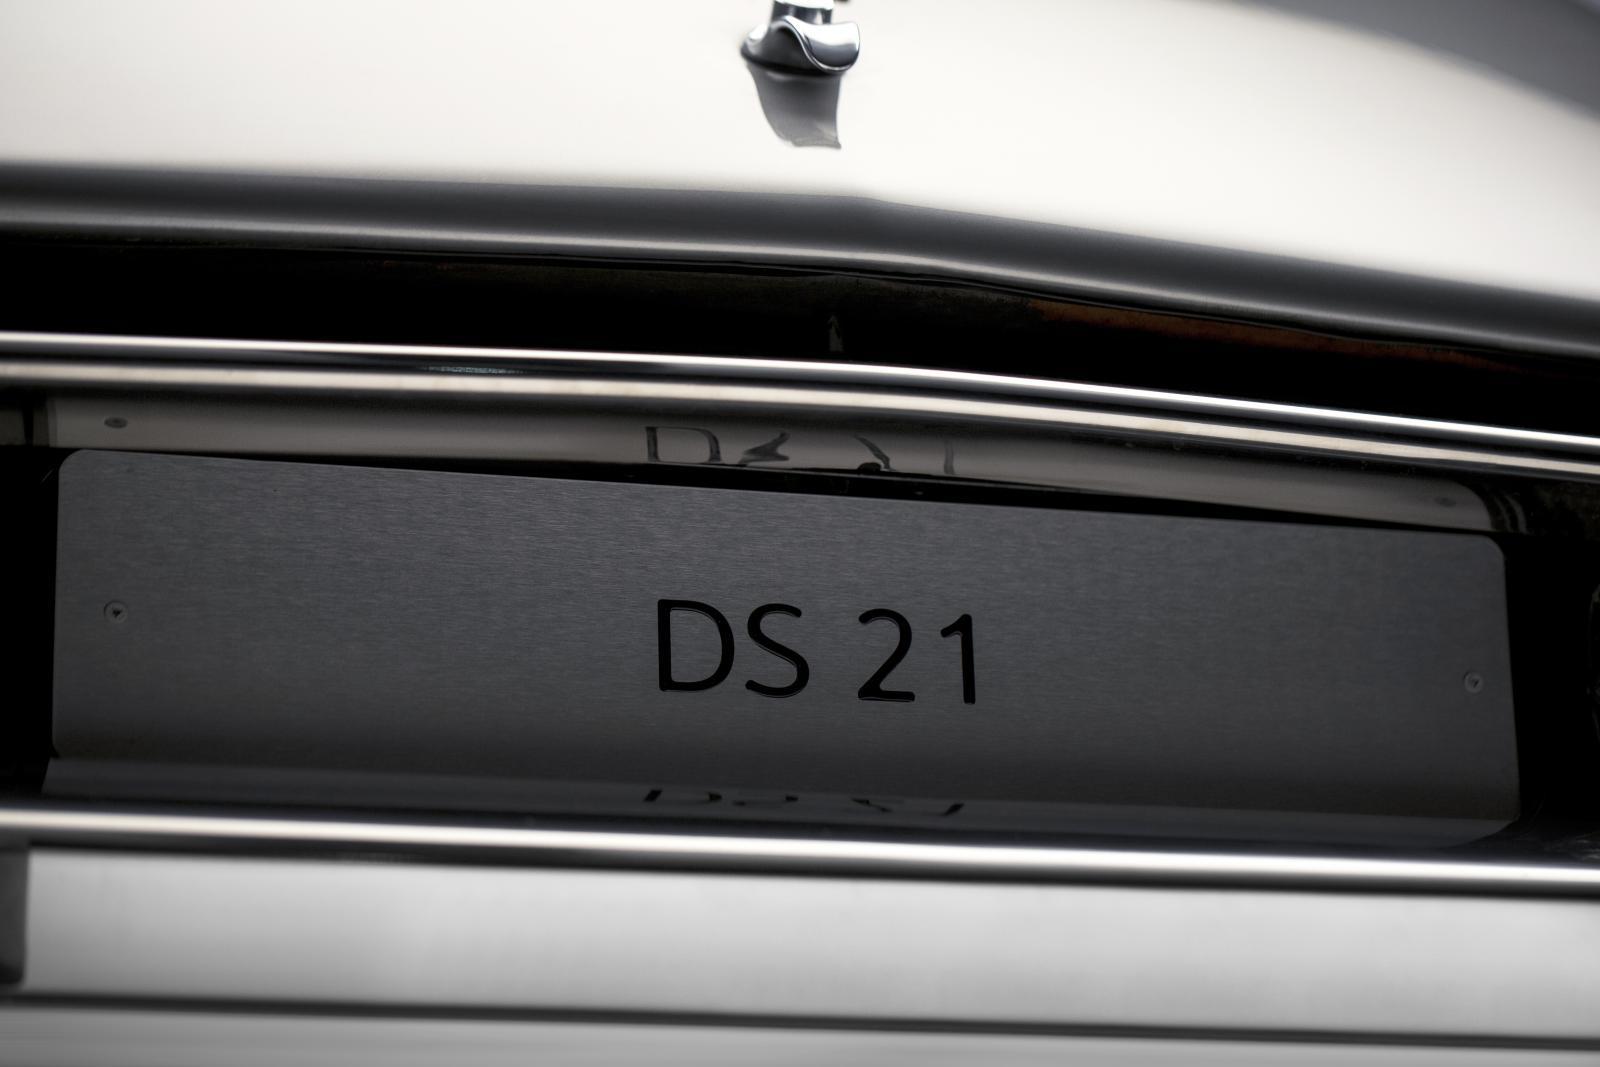 DS 21 - plaque